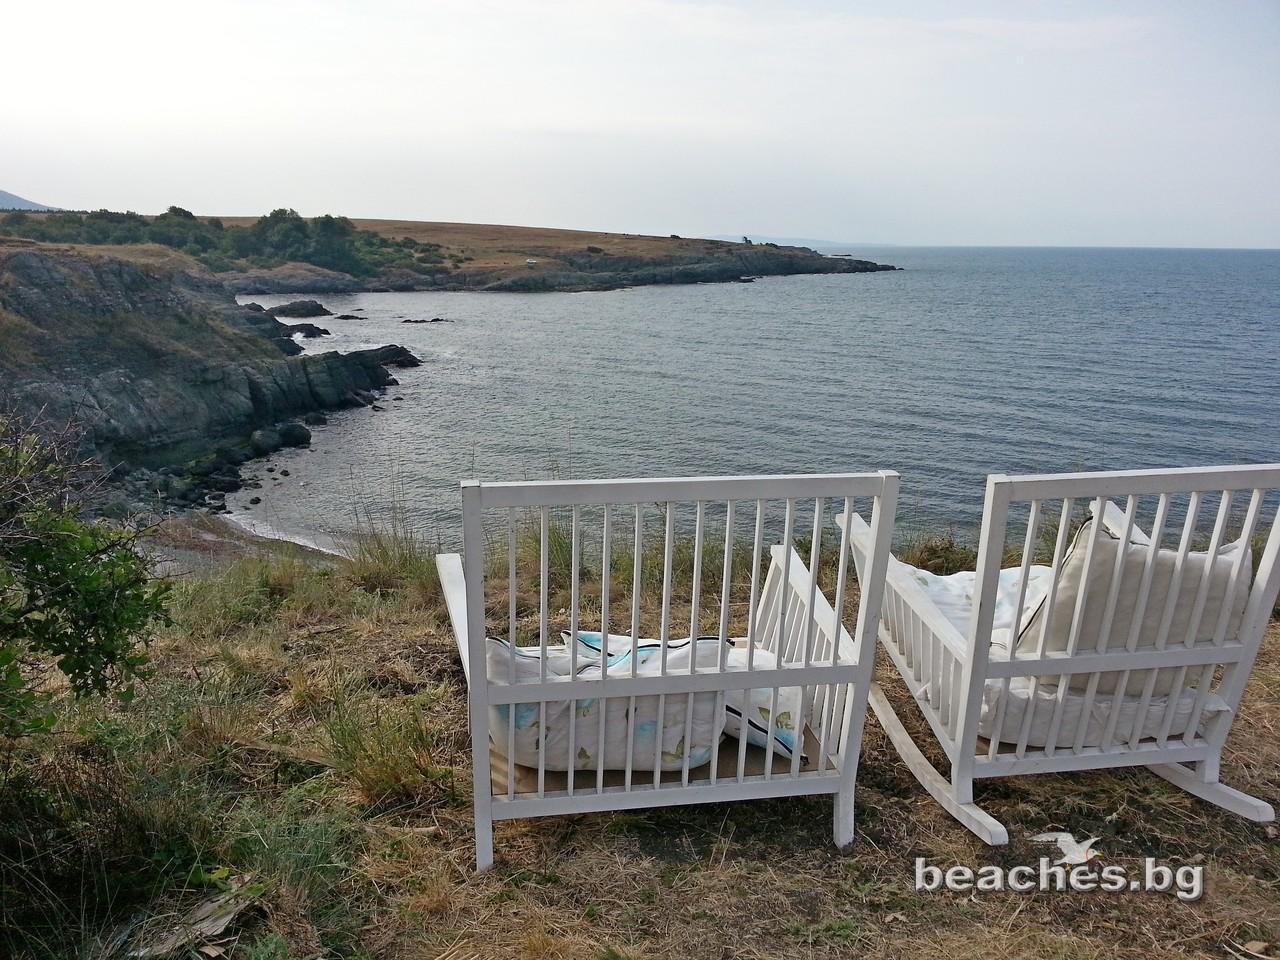 beaches.bg - Варвара, България